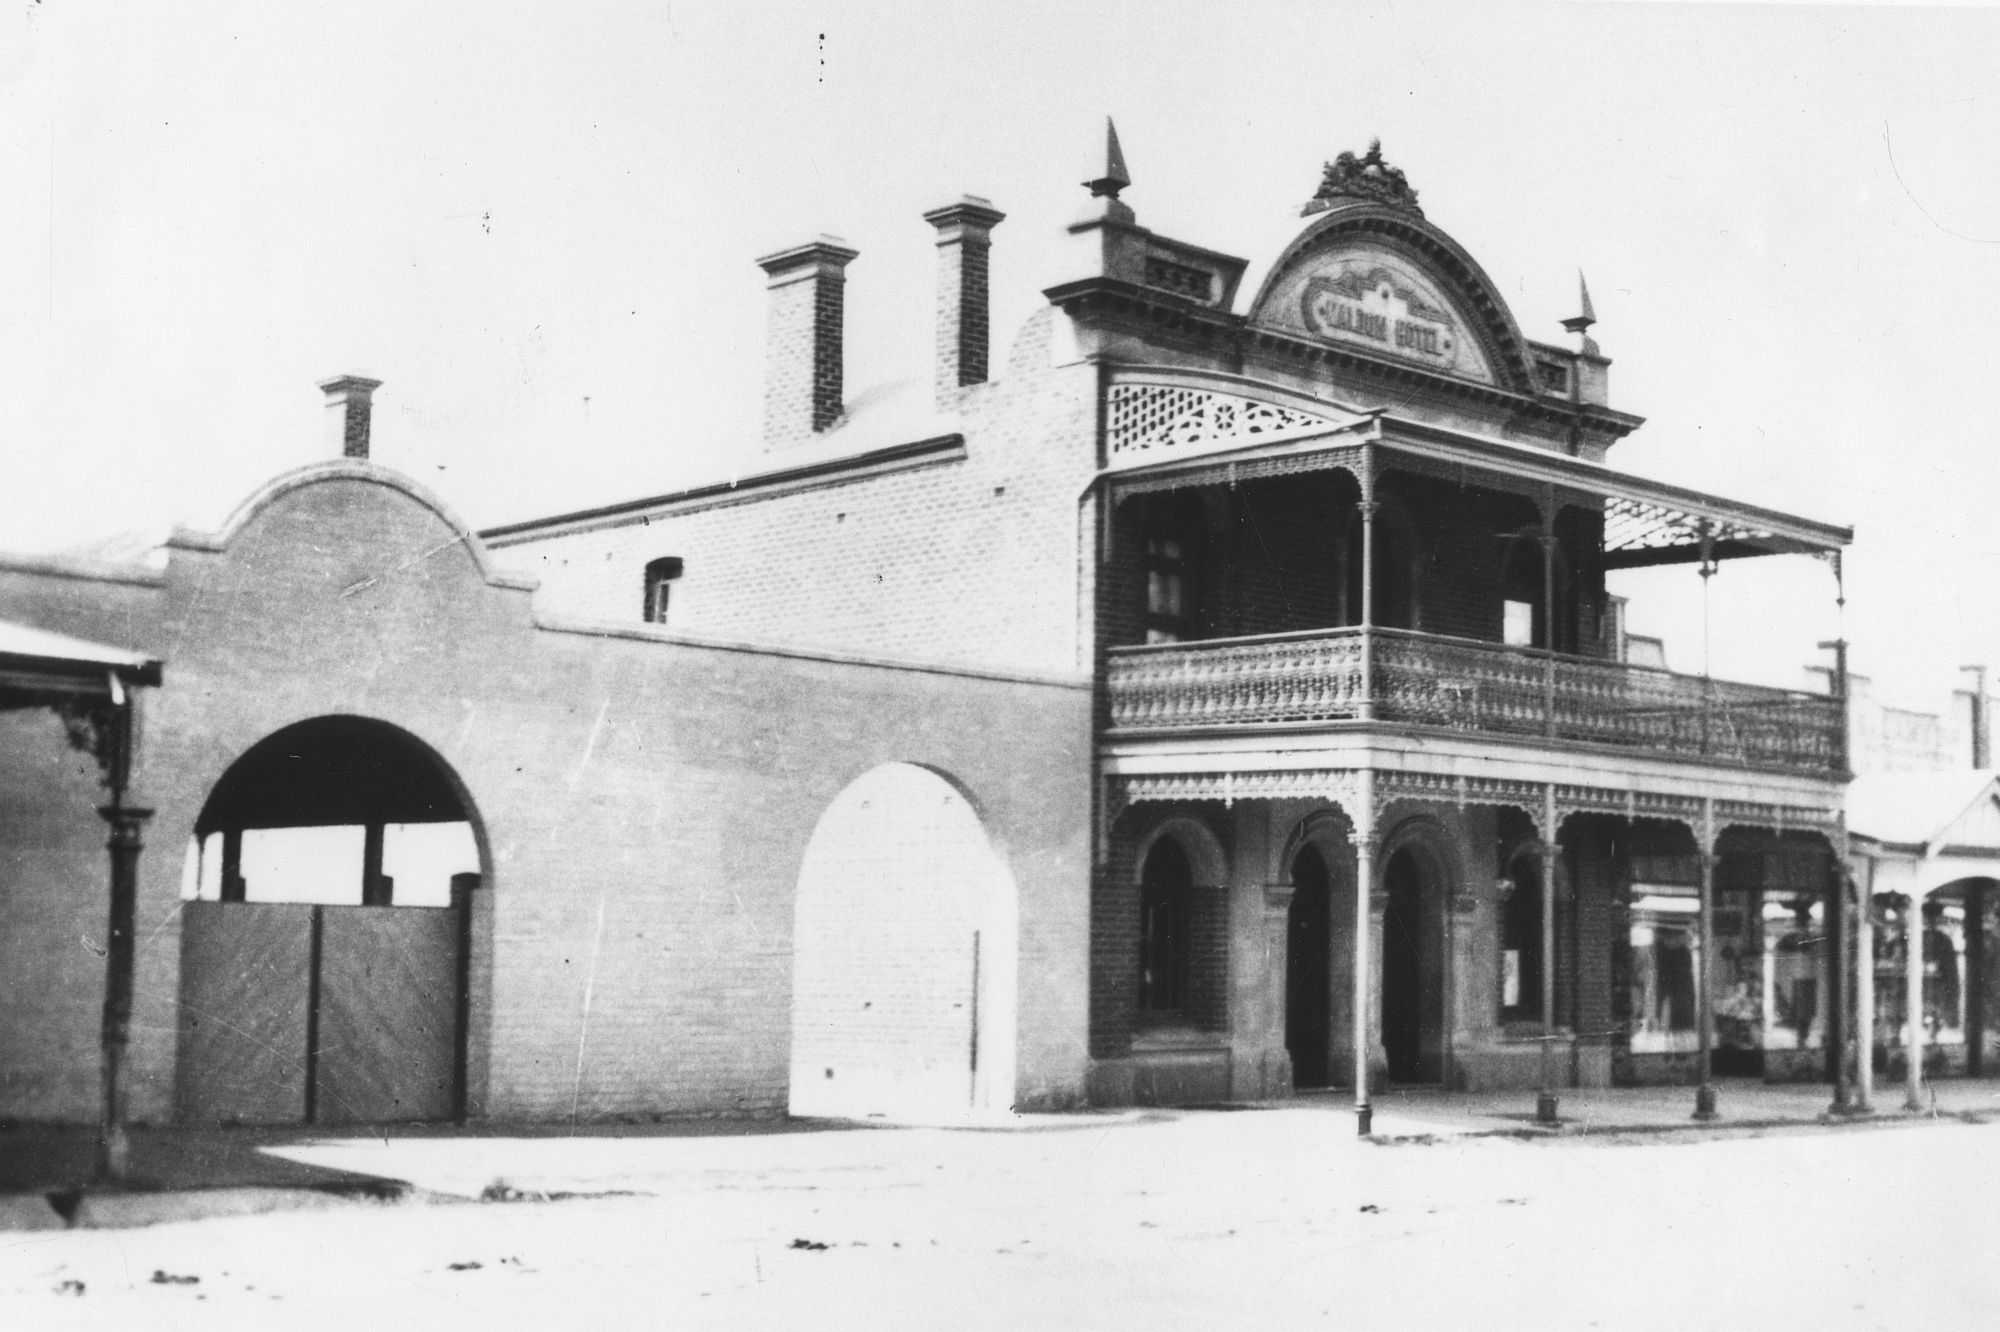 Maldon Hotel, 1909